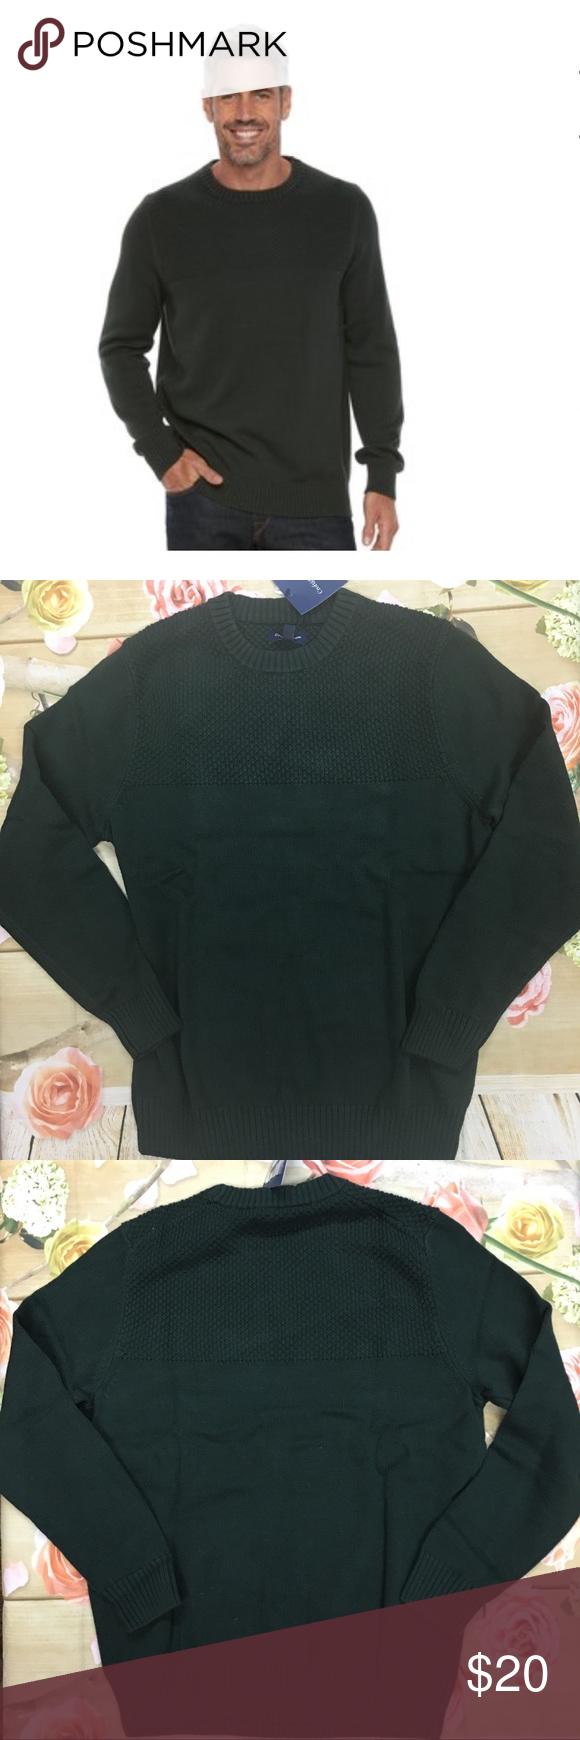 Relist Men S Croft Barrow Textured Yoke Sweater Sweaters Traditional Sleeve Clothes Design [ 1740 x 580 Pixel ]